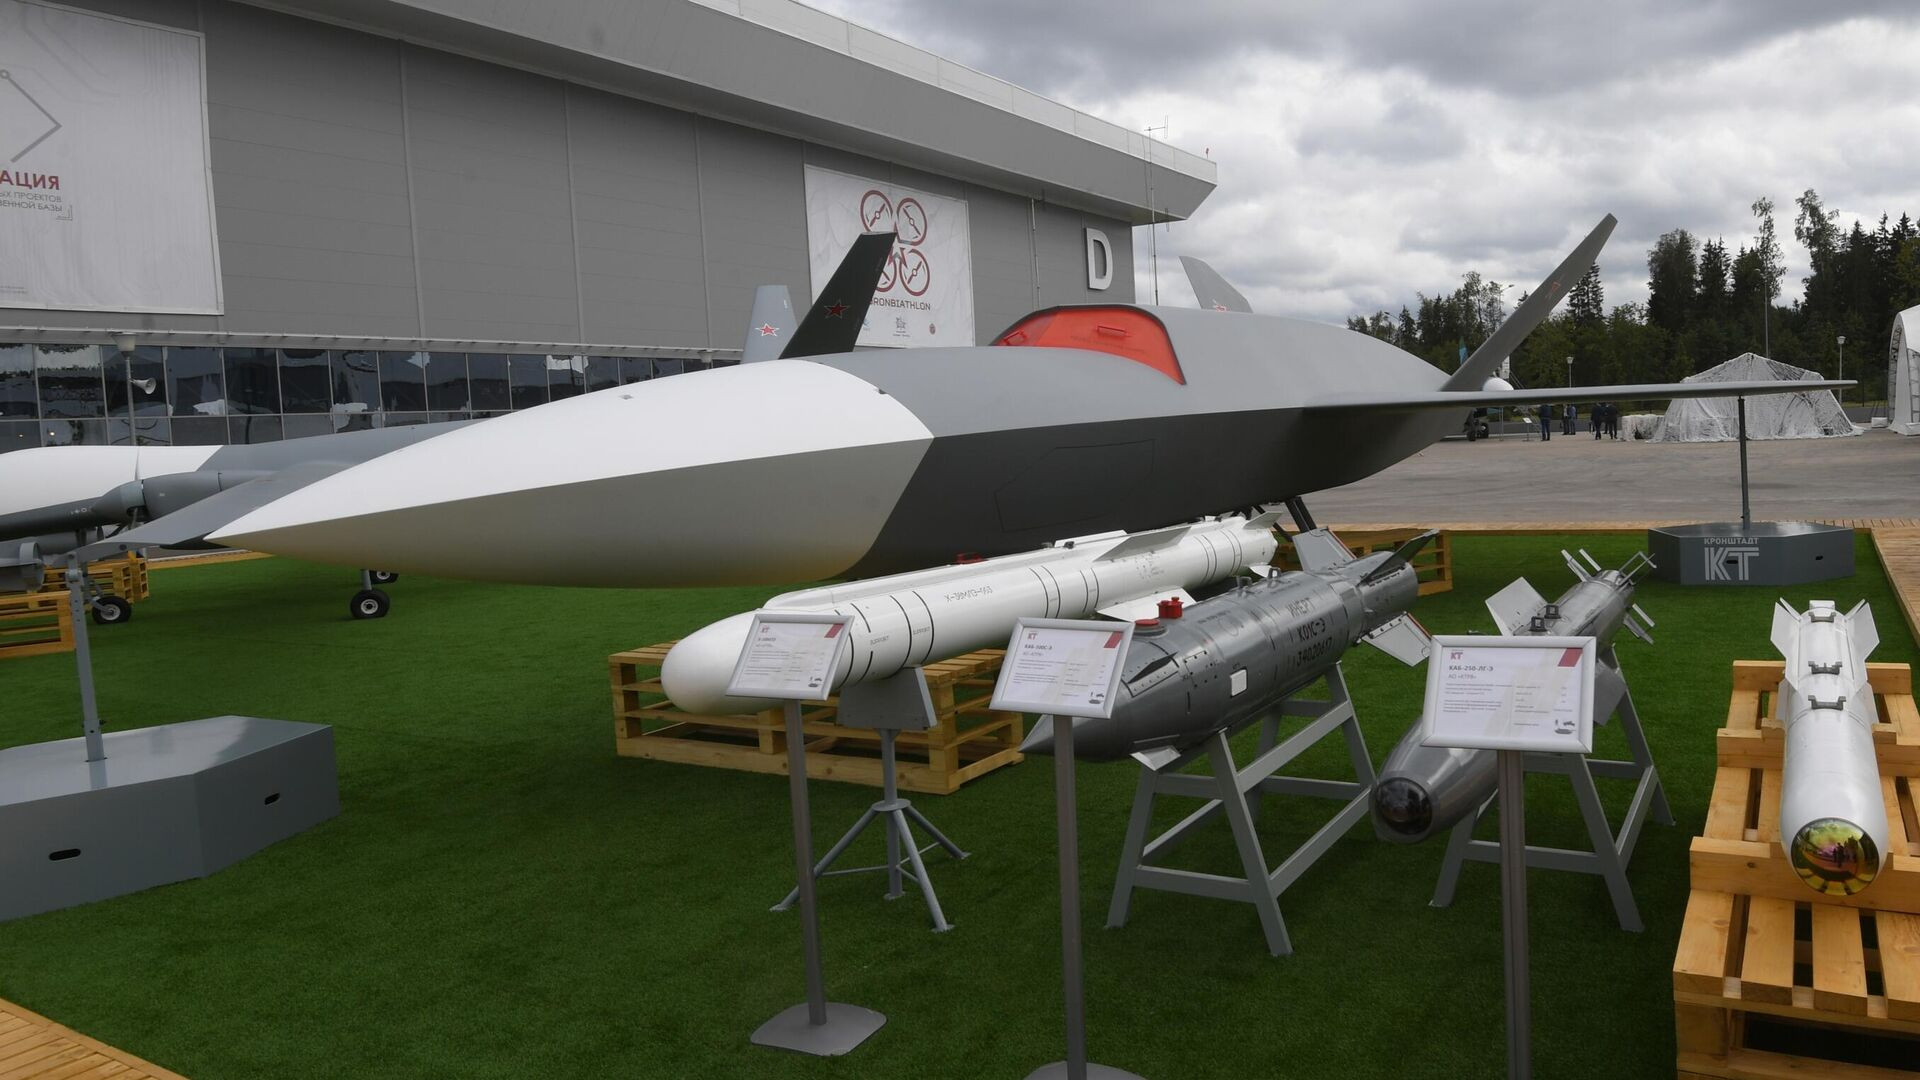 El dron de ataque ruso Grom - Sputnik Mundo, 1920, 29.08.2021